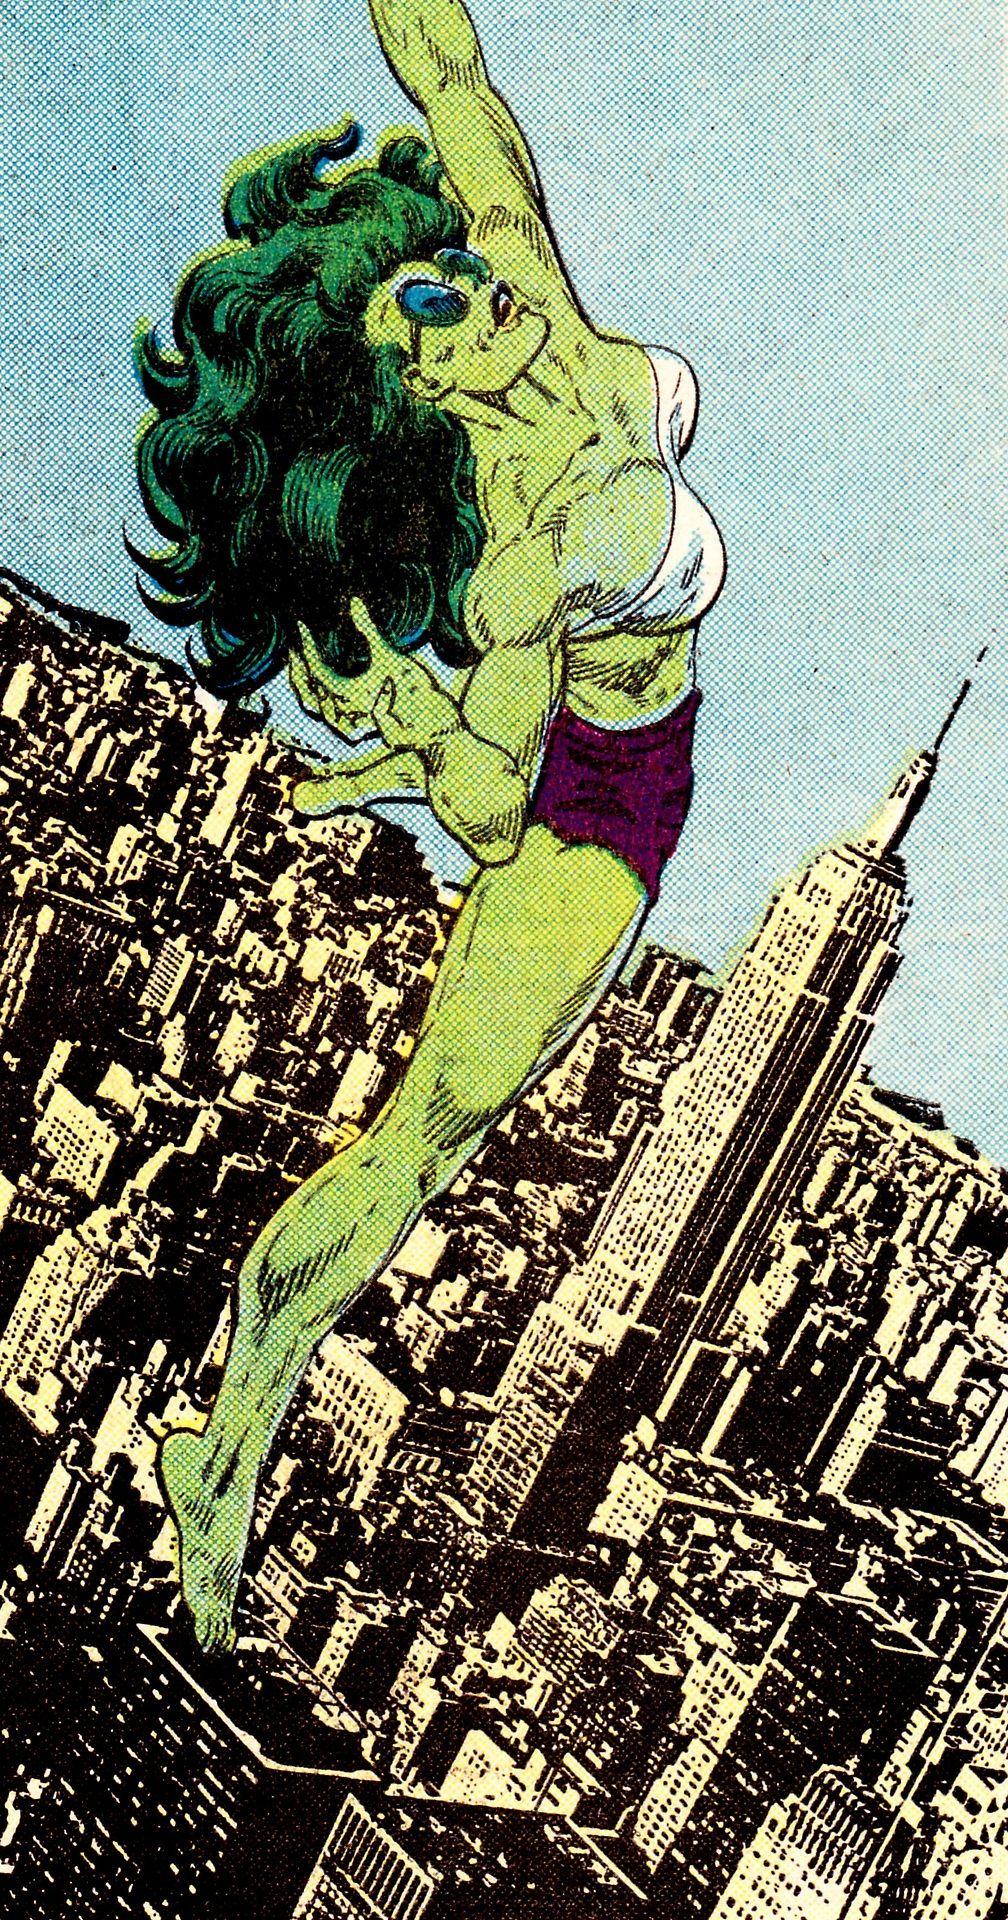 Jthenr Comics Vault Fantastic Four 275 Feb 1985 Art By John Byrne Pencils Al Gordon Inks Amp Glynis Wein Co Vintage Comics Shehulk Comic Books Art